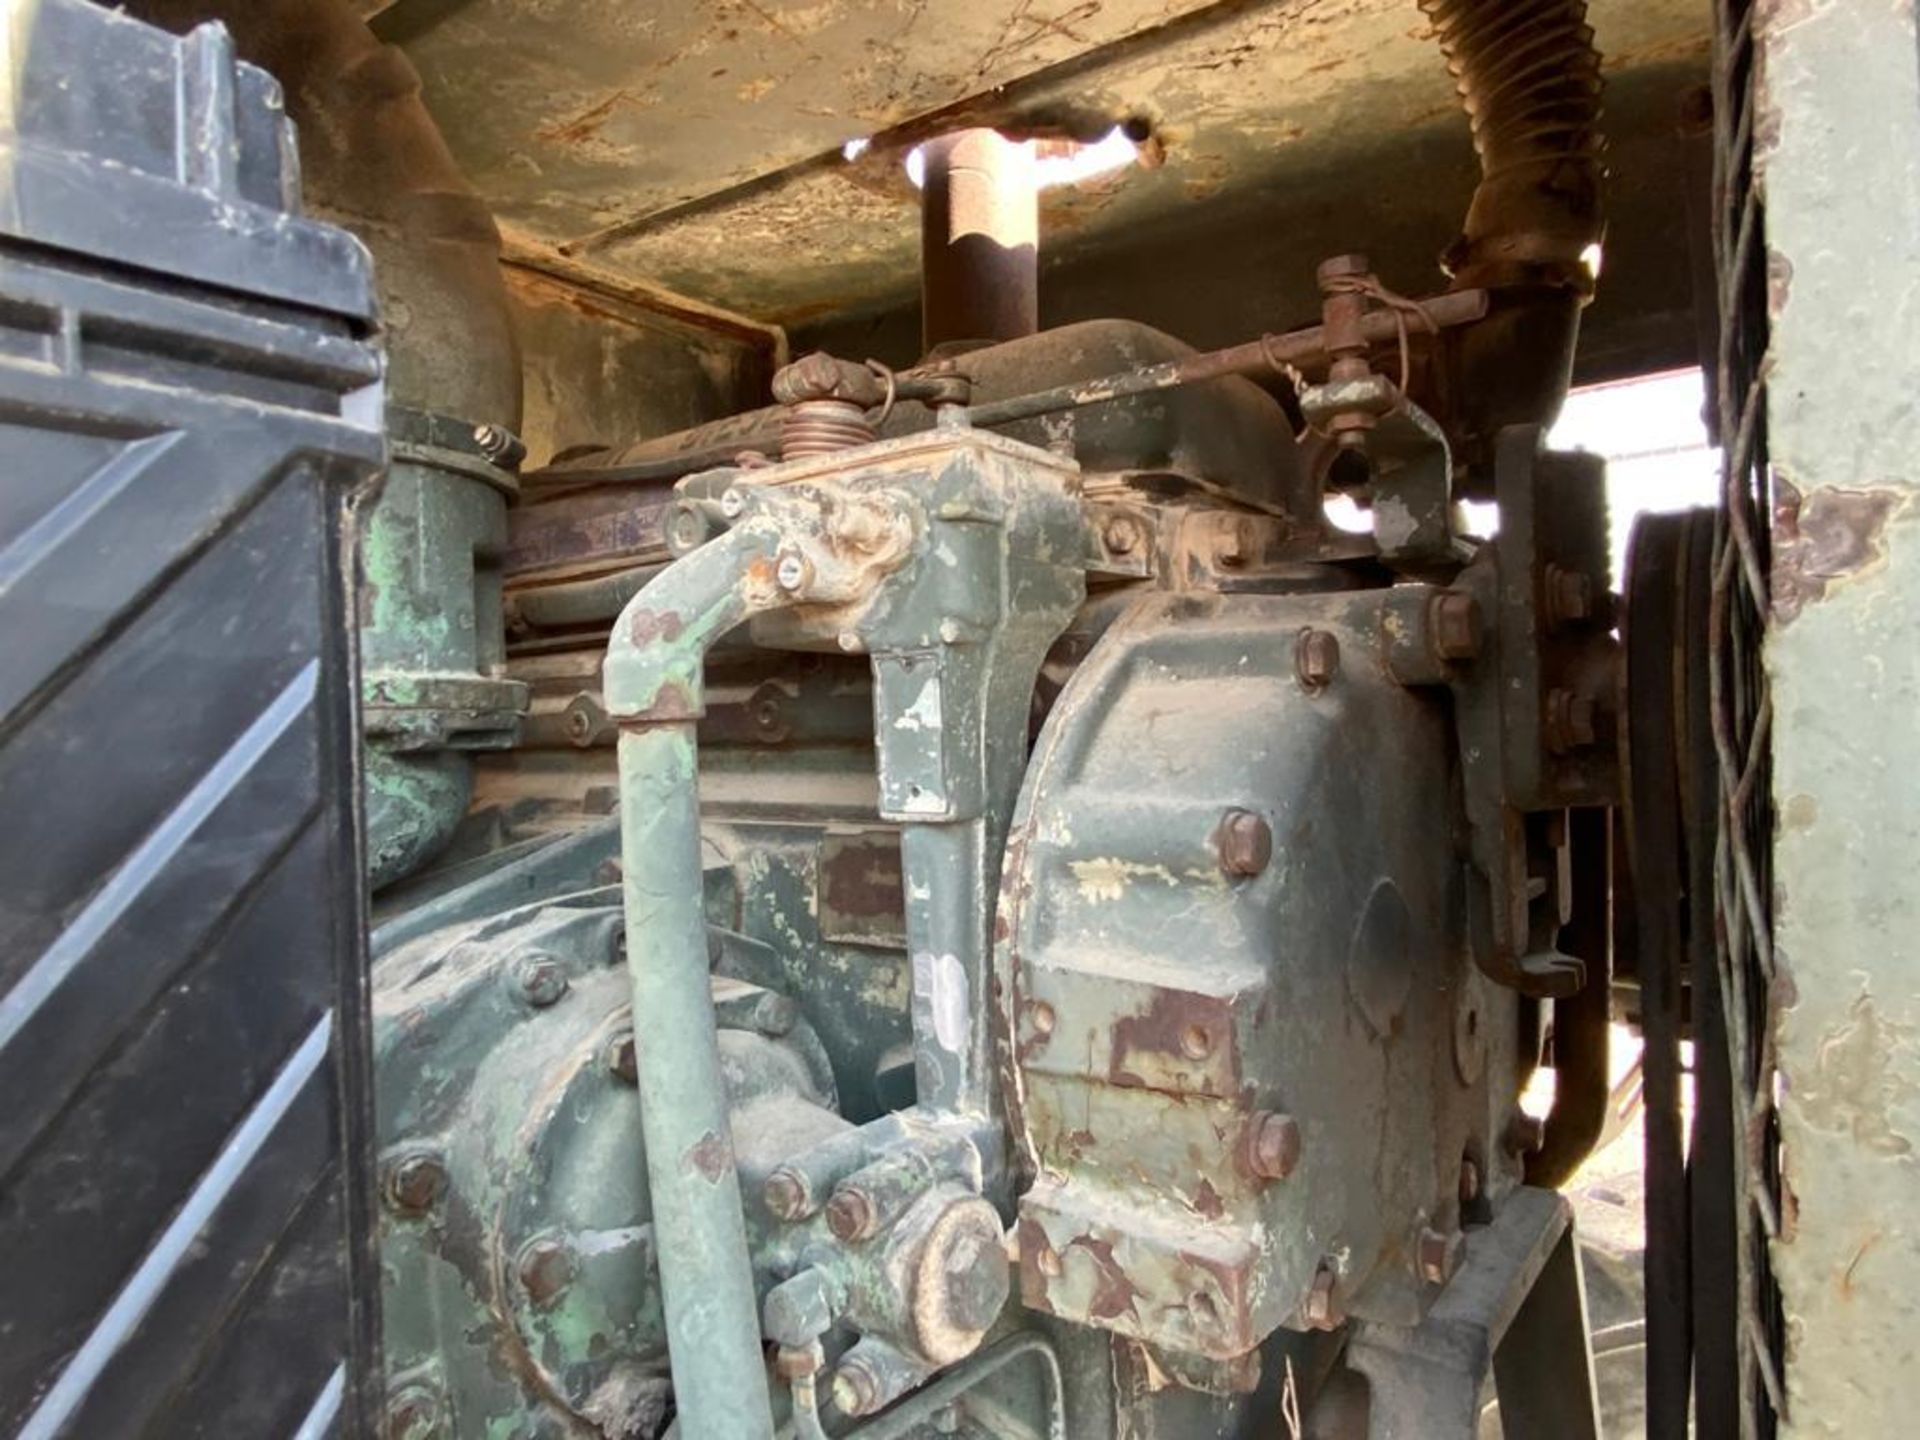 1970 Wabco4 440H Motor Grader, Serial number 440HAGM1398 - Image 71 of 77